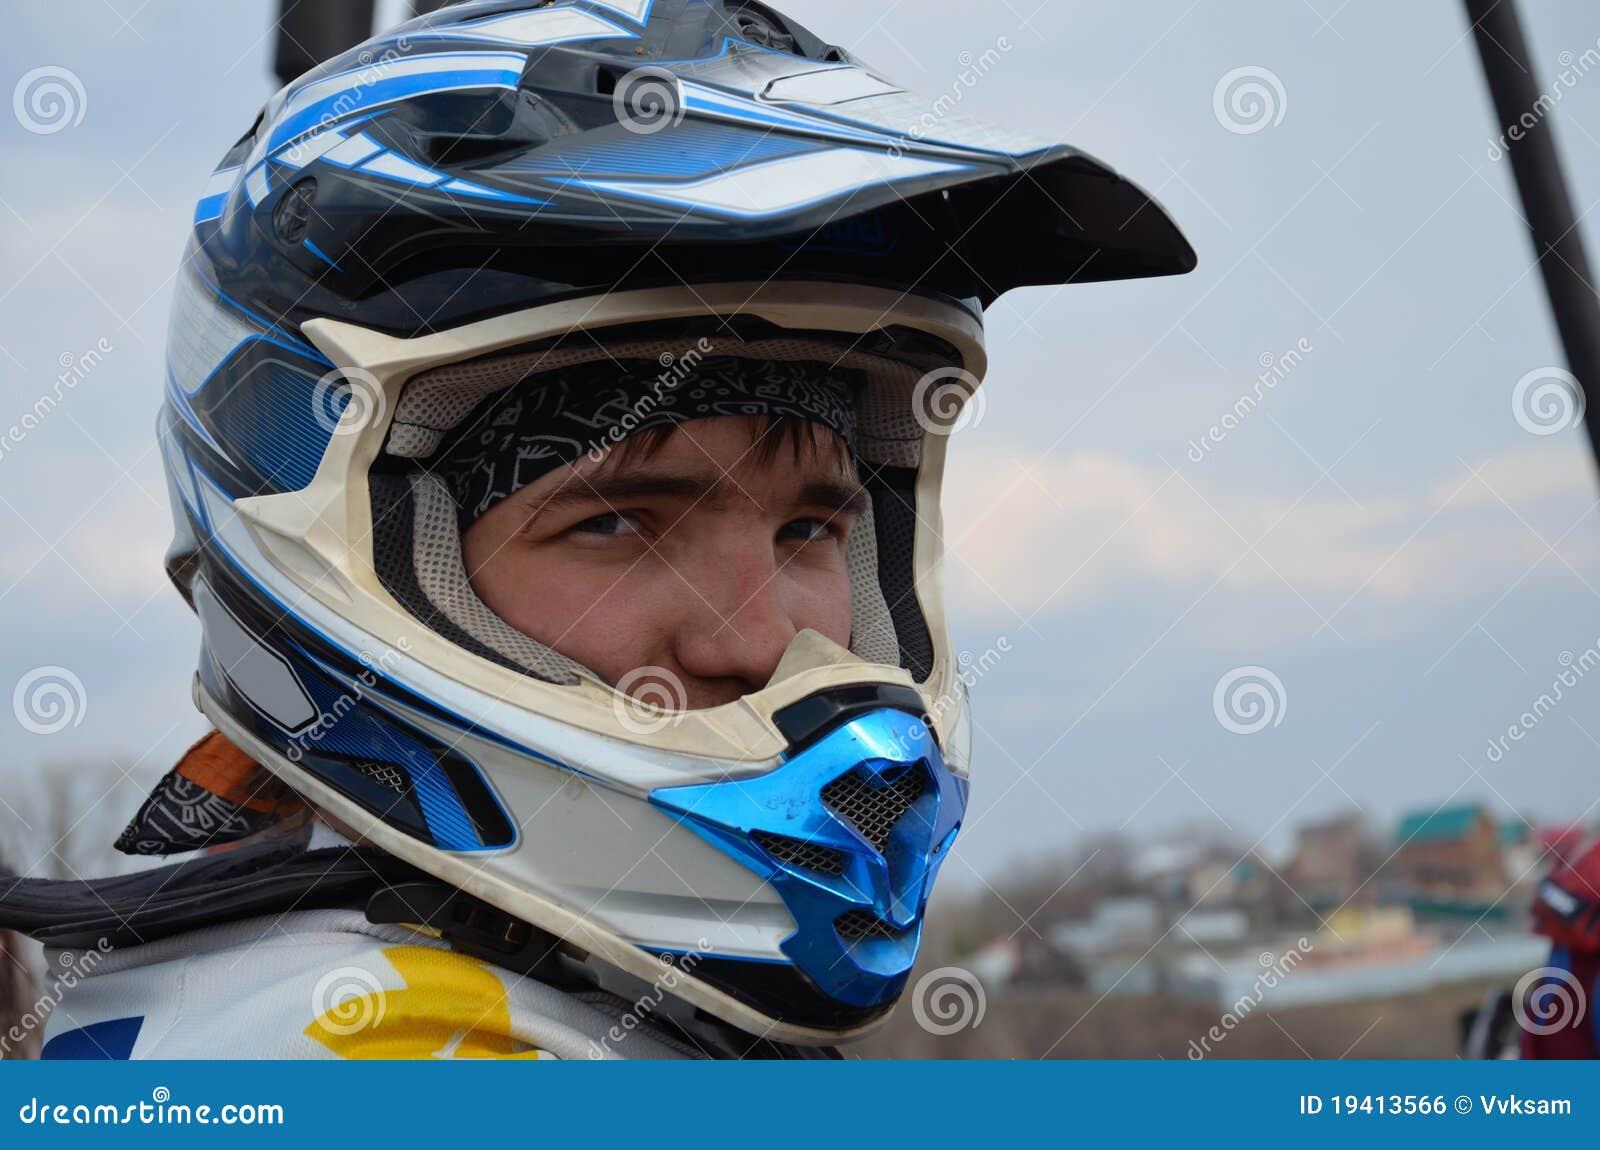 Motocross Rider In A Helmet Stock Photo Image Of